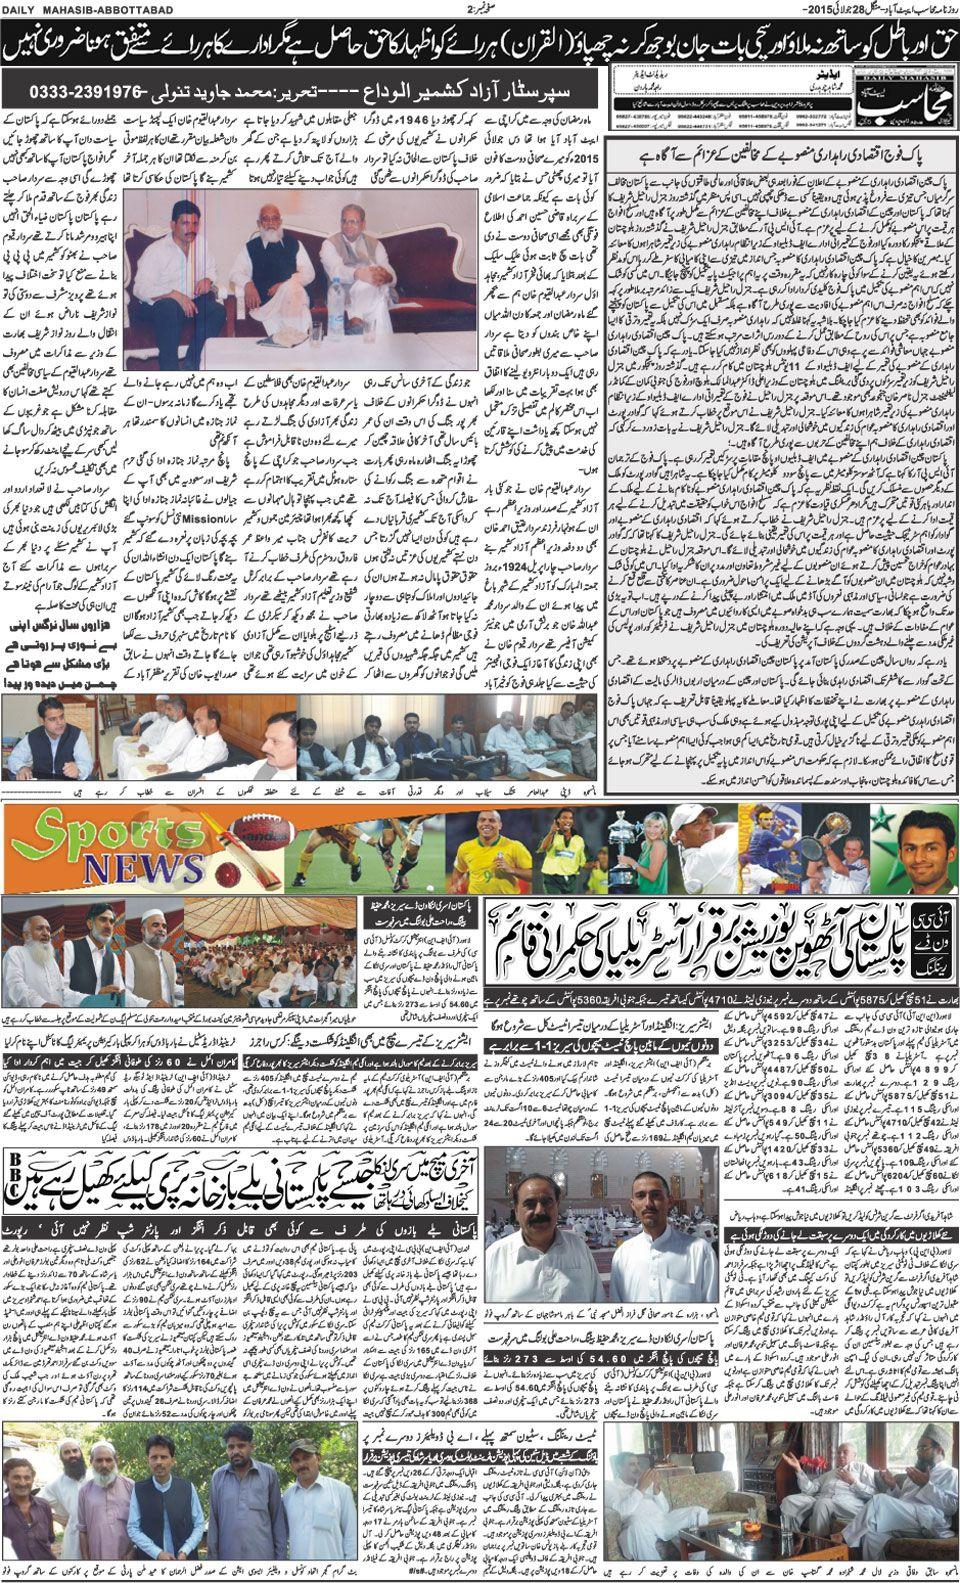 Daily Mahasib Abbottabad Edition Online EPaper Pakistan